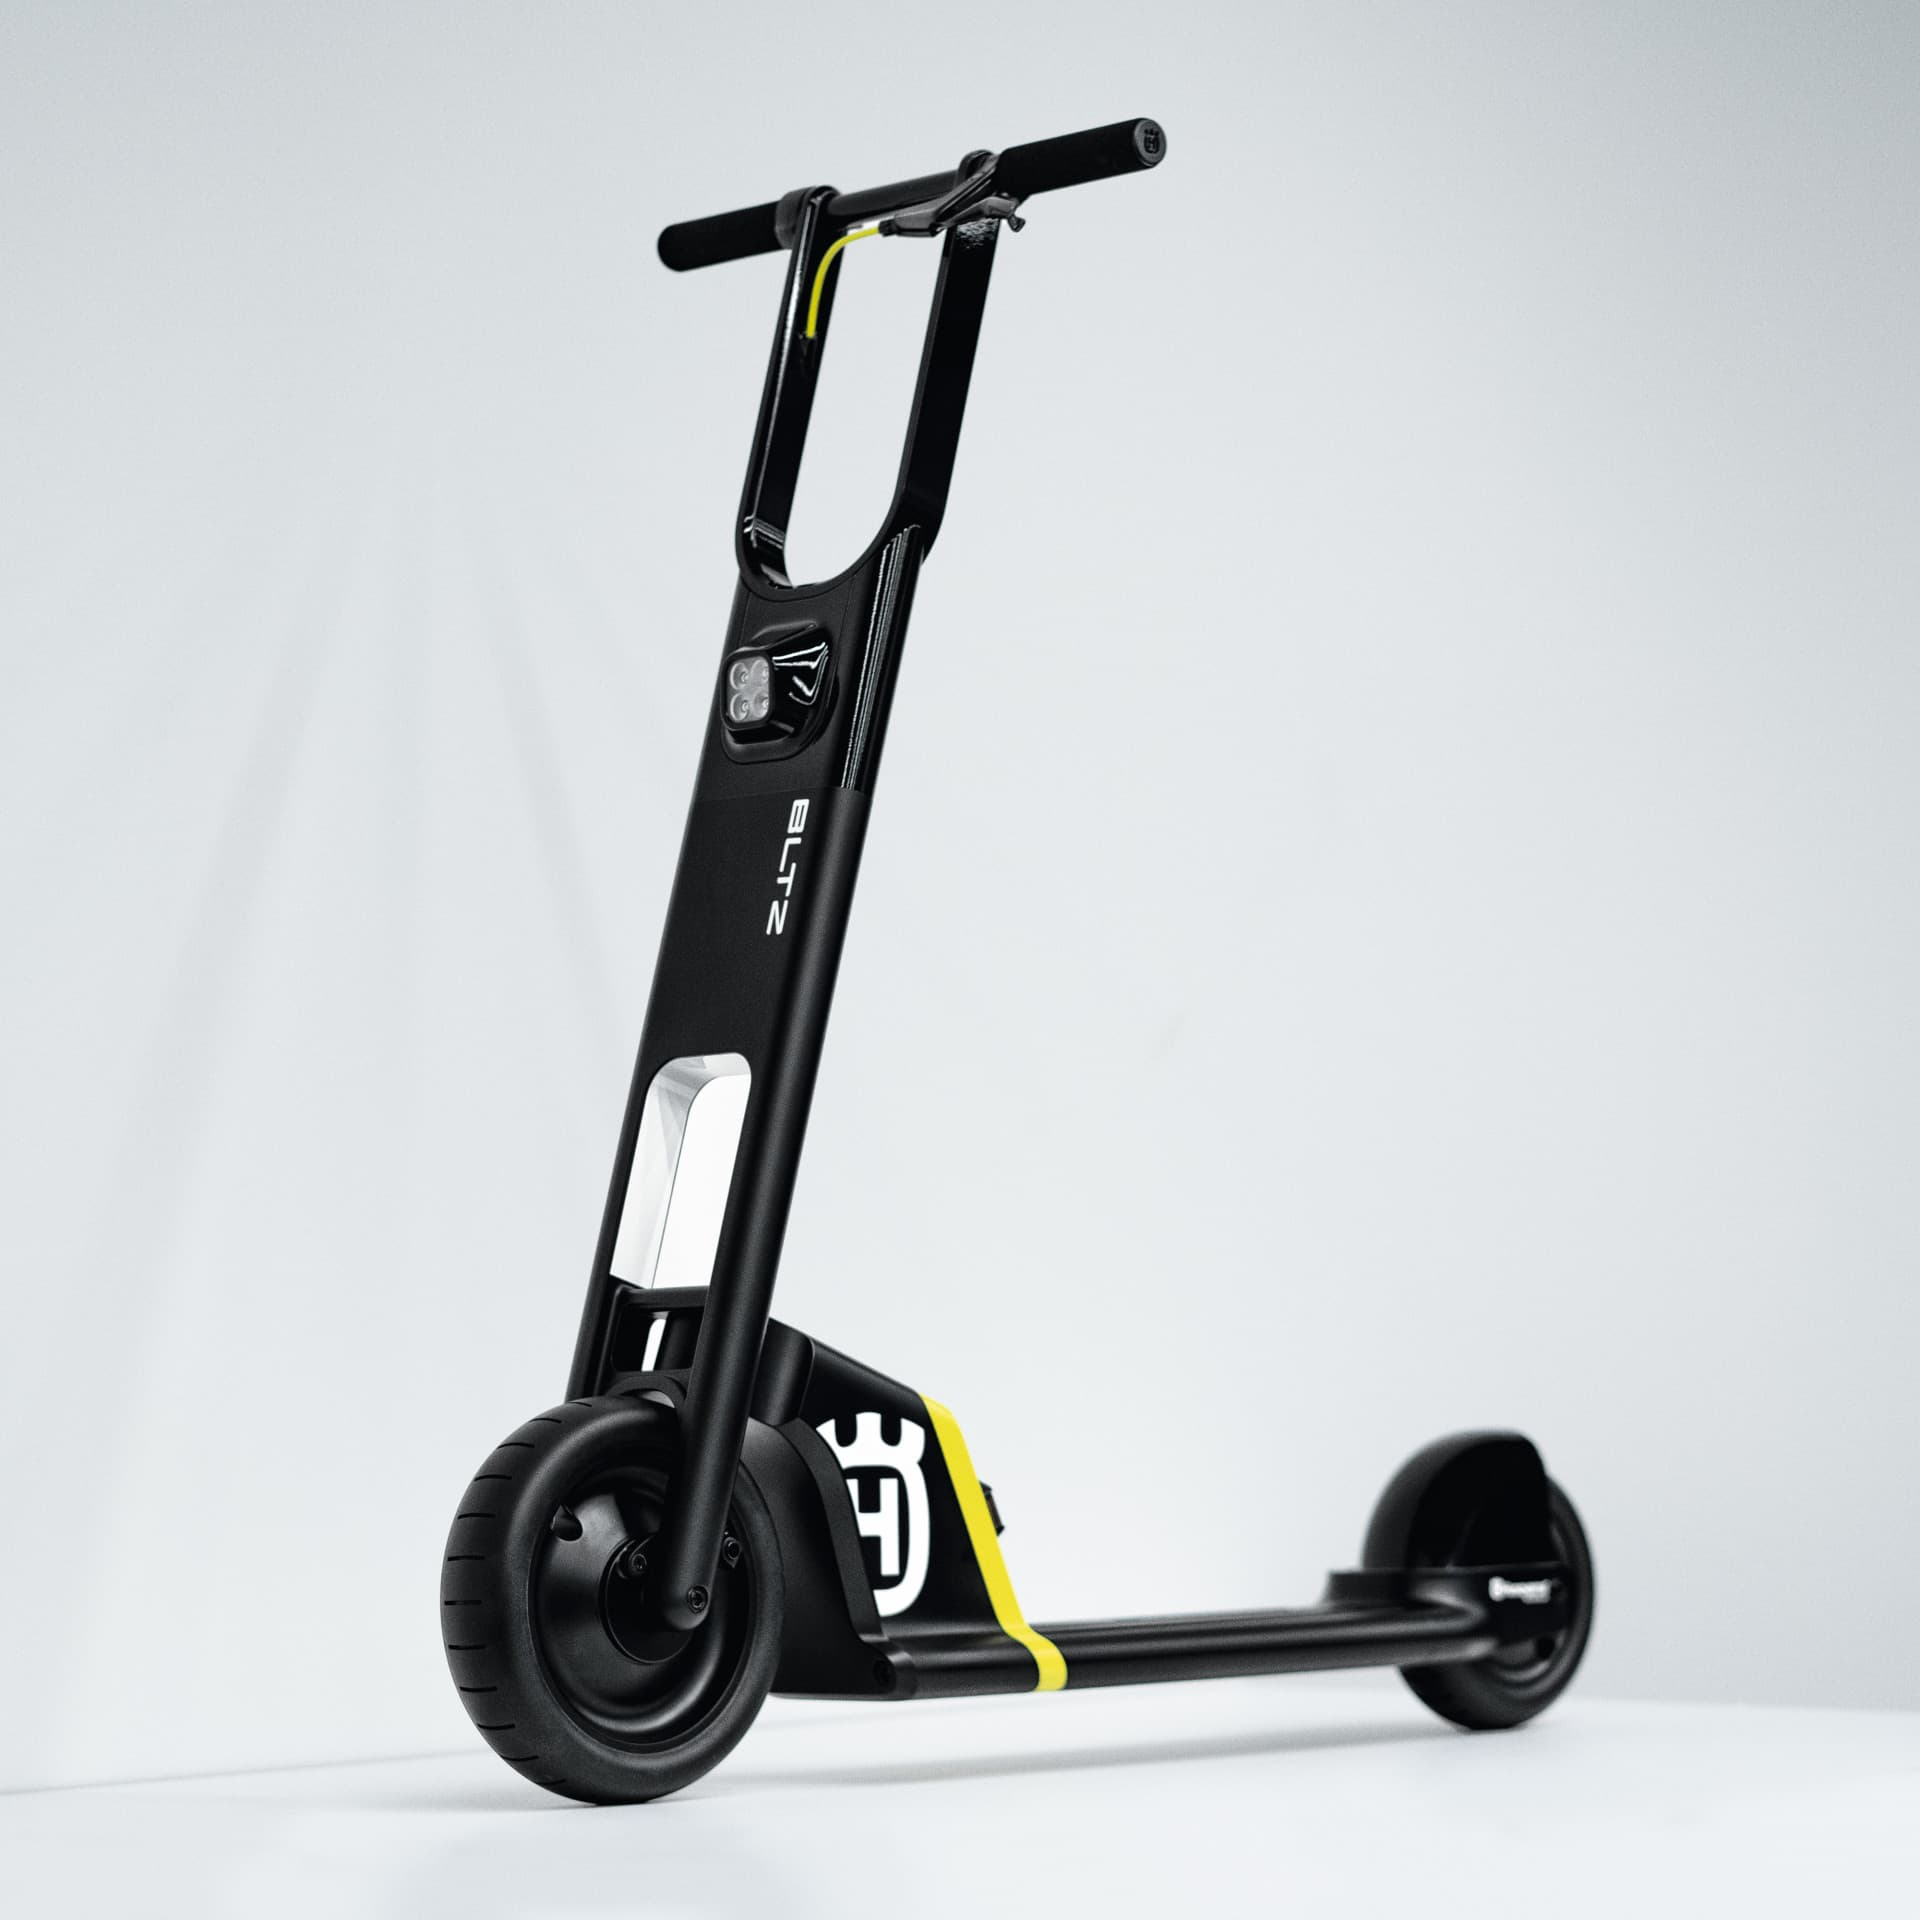 Husqvarna Bltz Concept Patinete Electrico 01